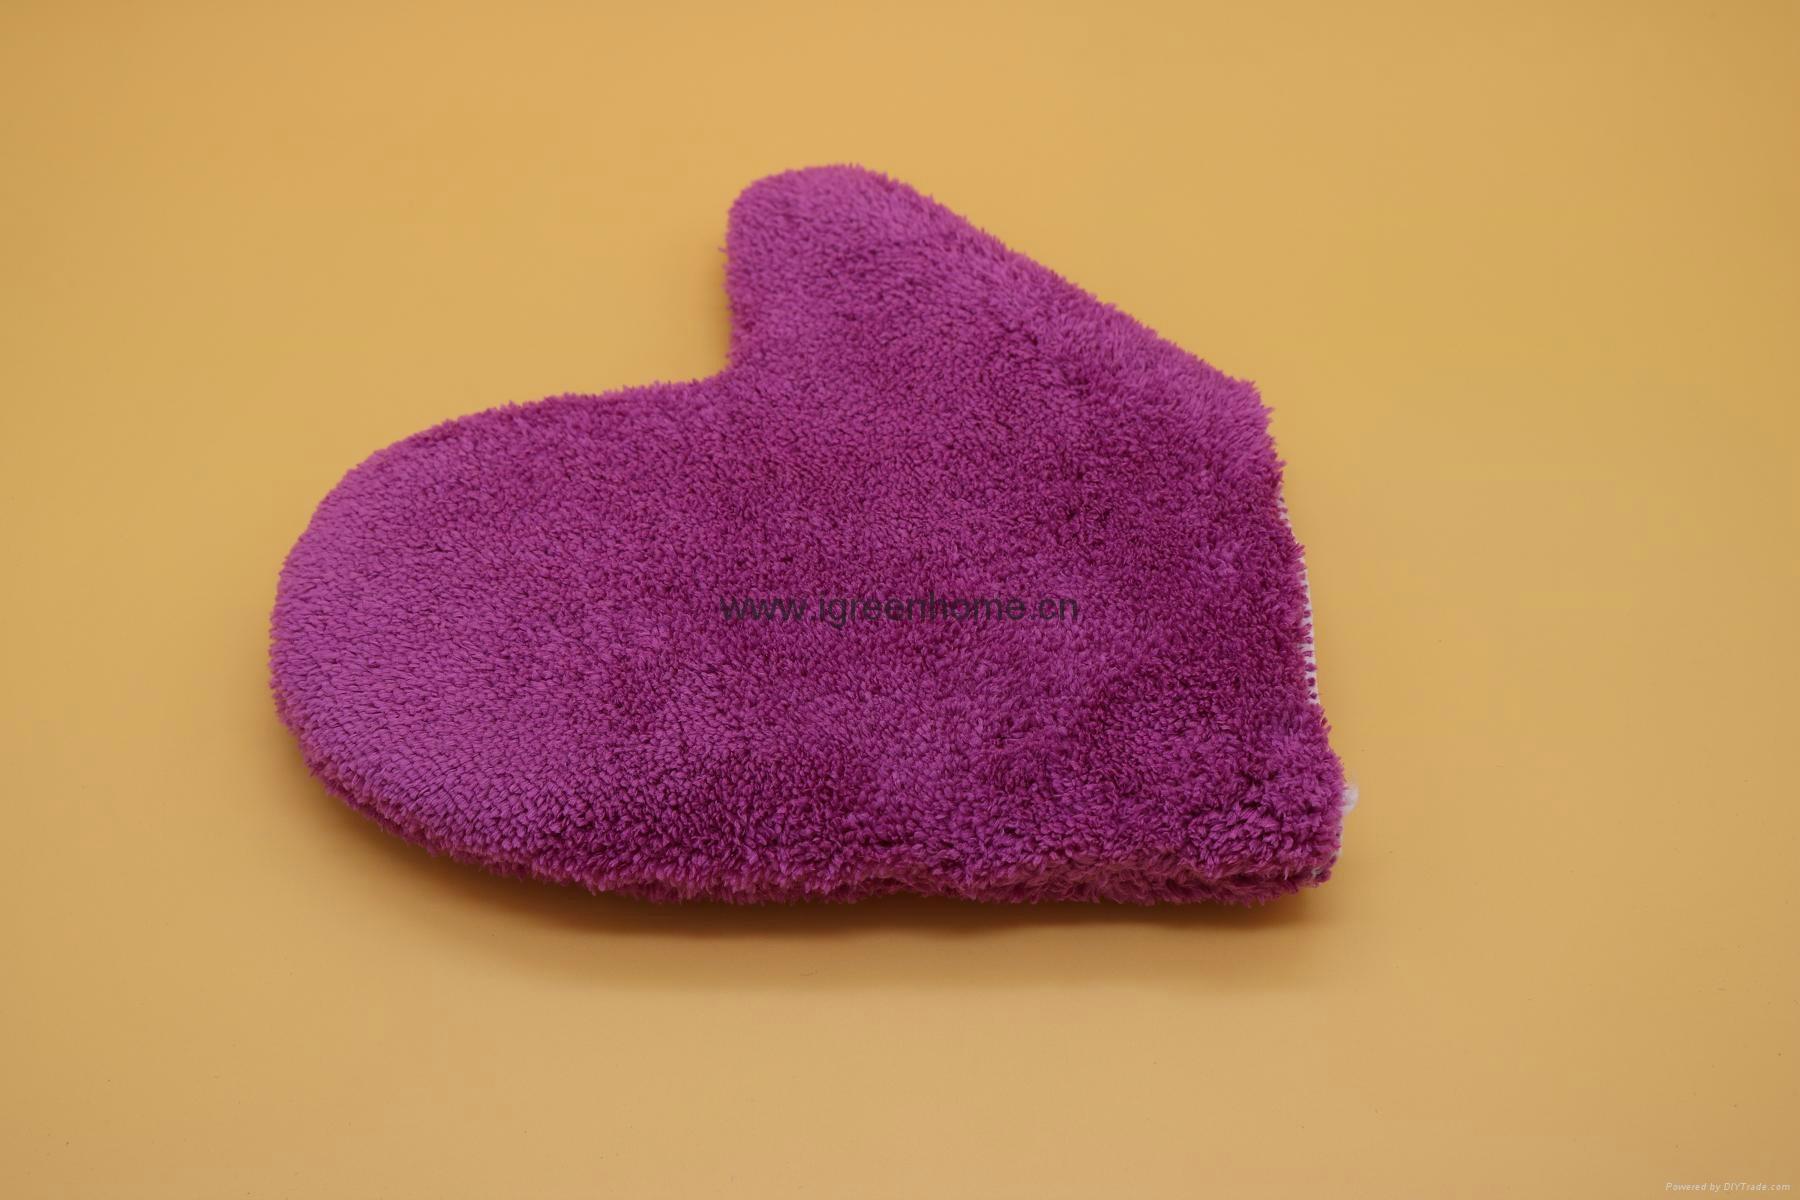 microfiber cleaning glove 3